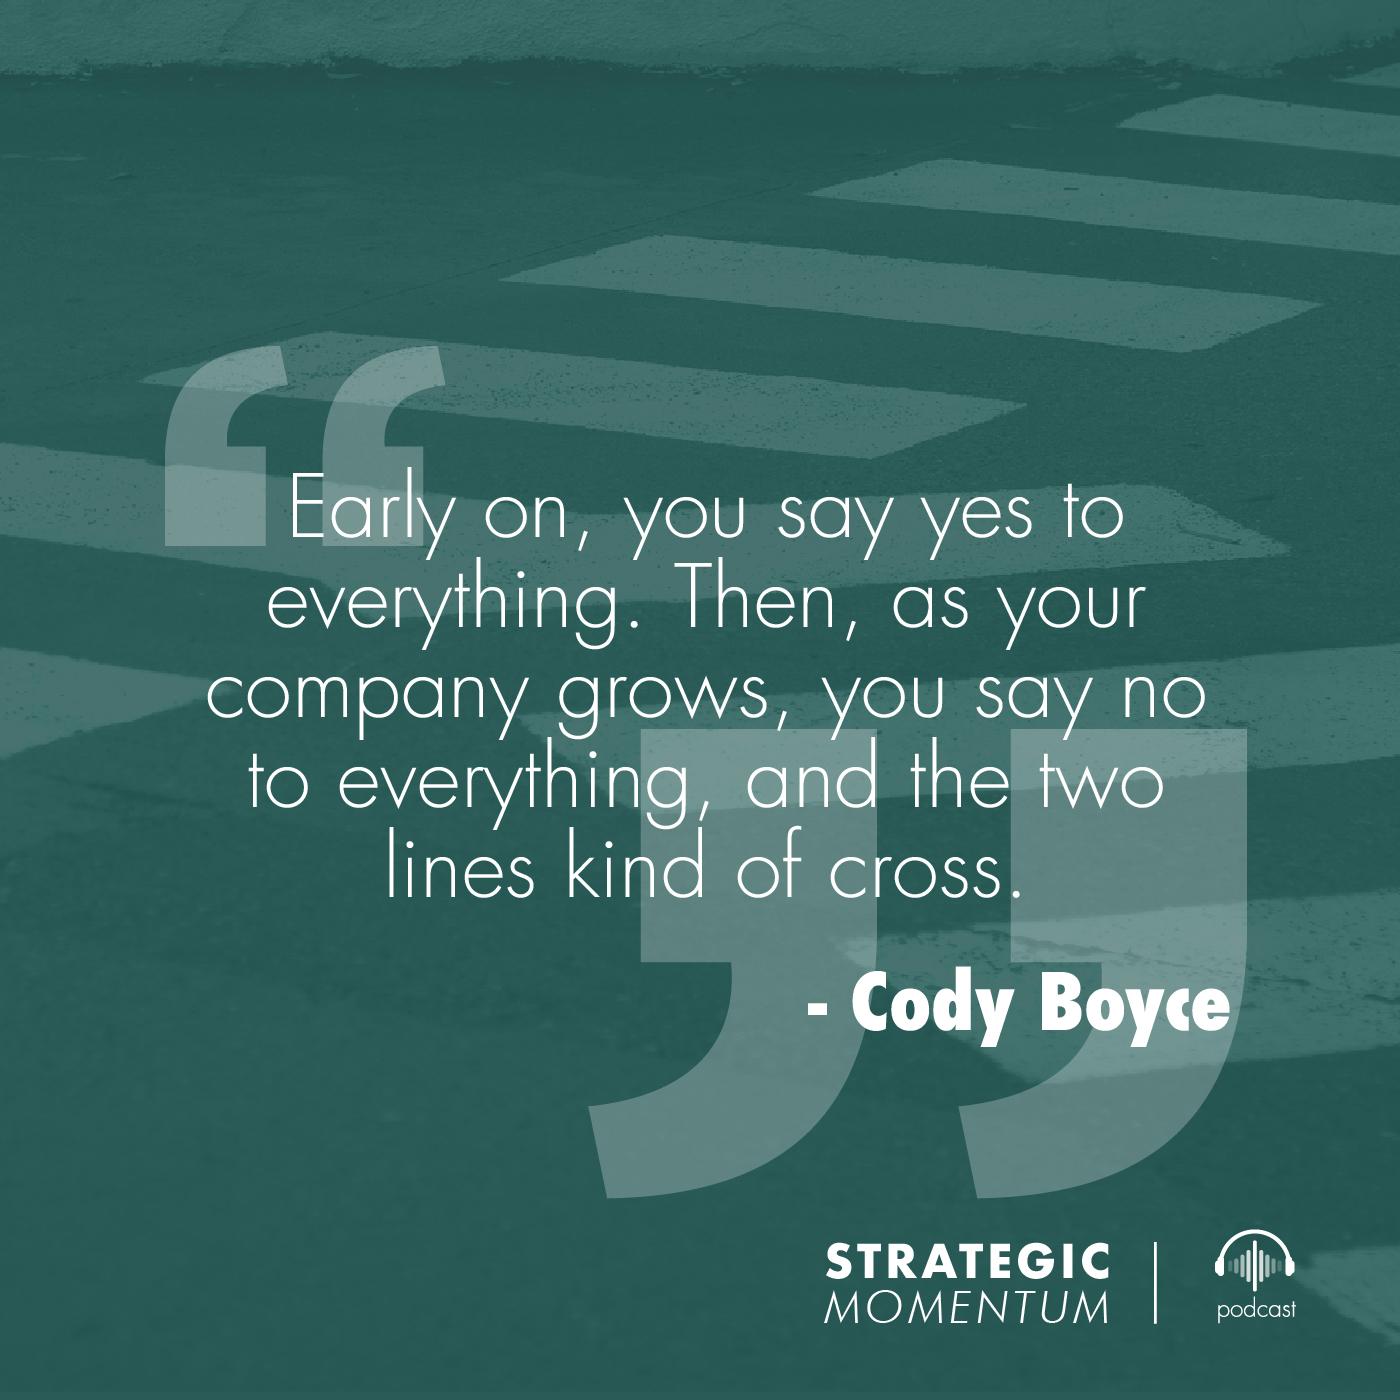 Cody Boyce Quote | Strategic Momentum Podcast